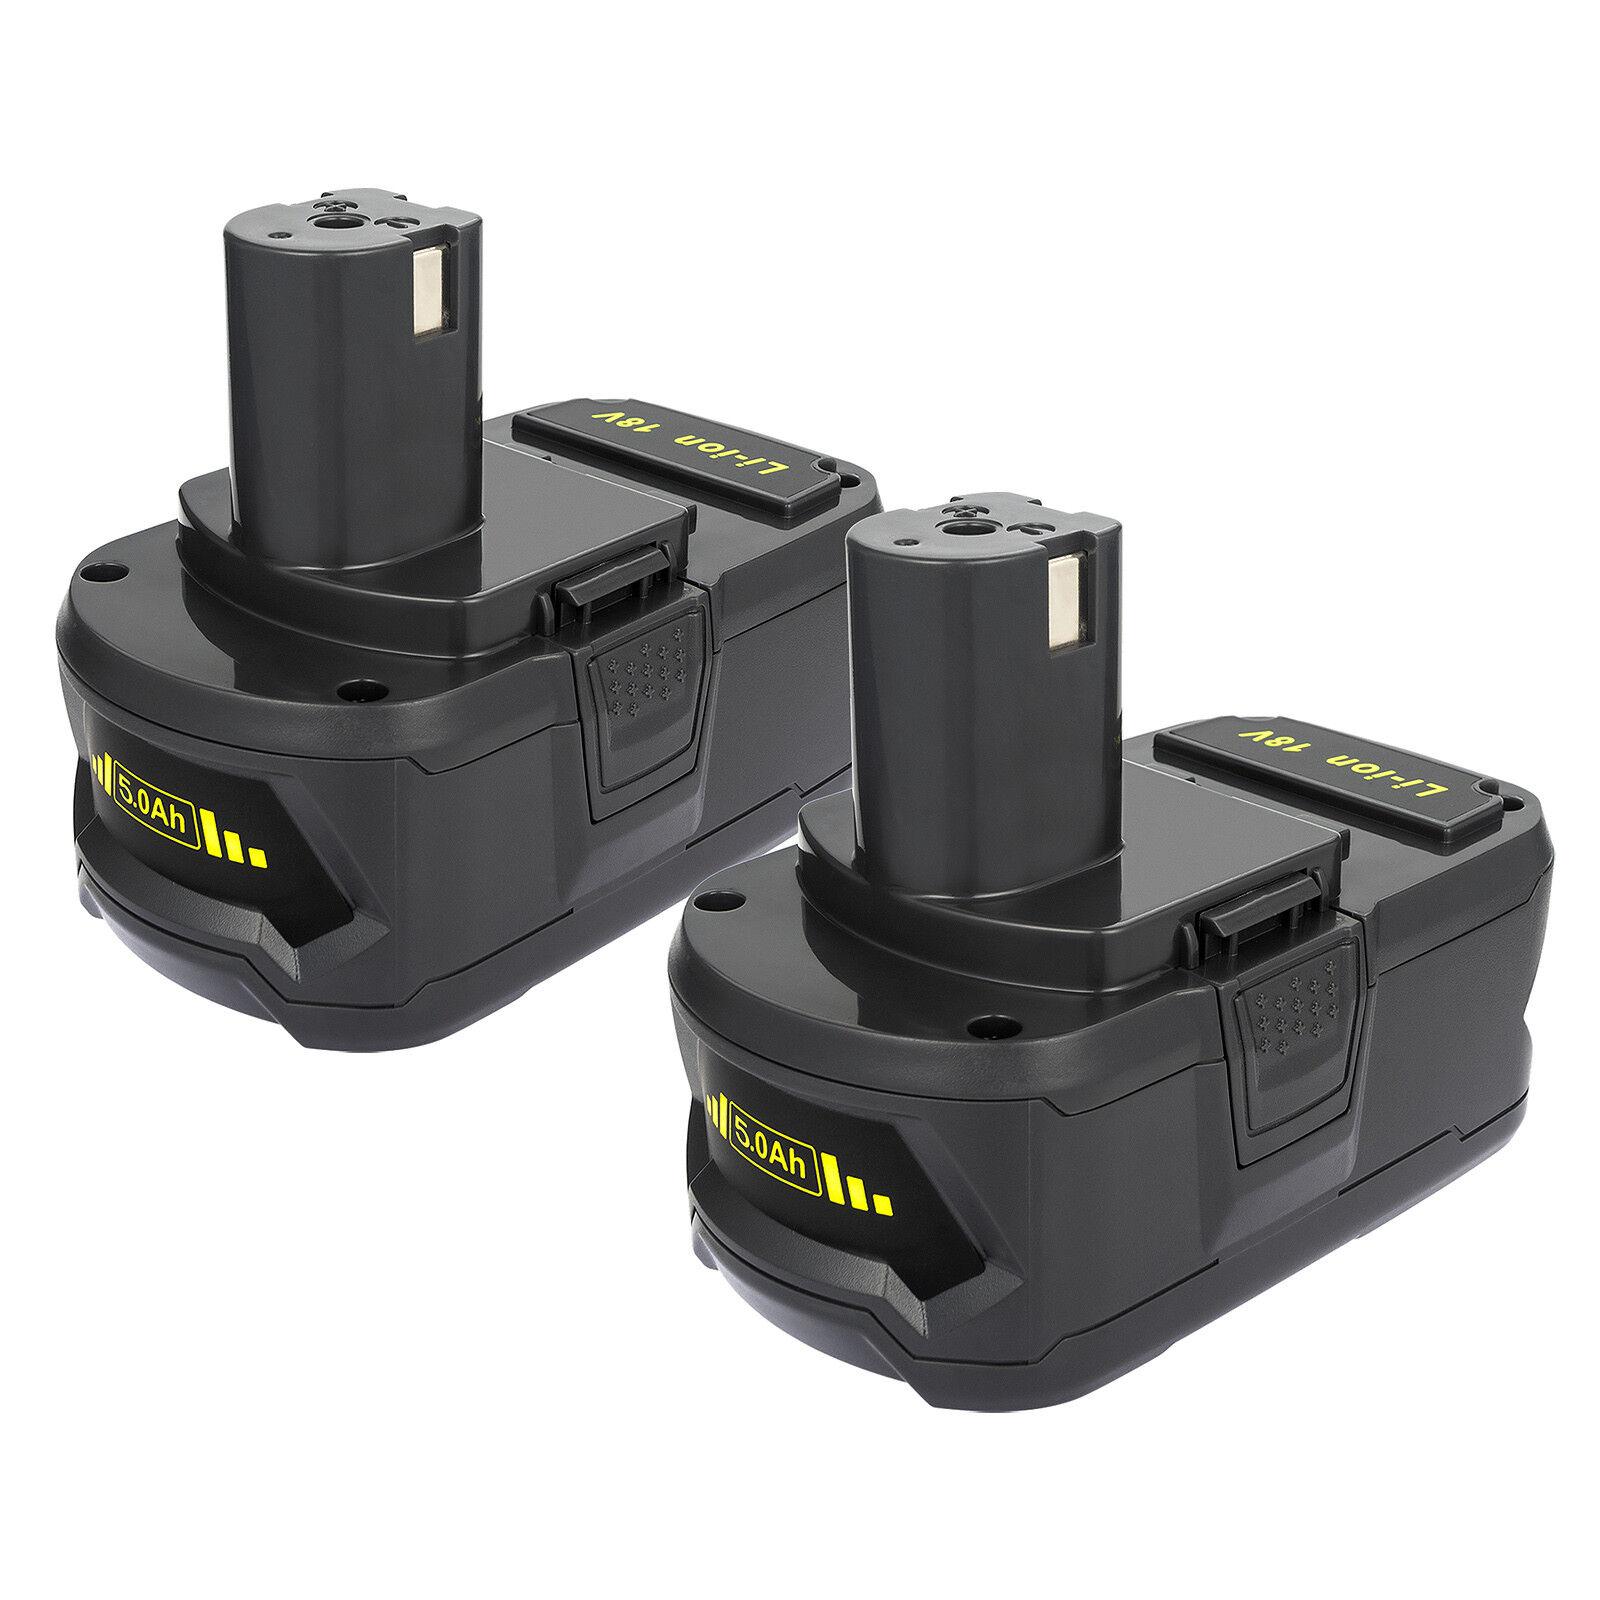 2 X 5000mAh 18V Akku für Ryobi ONE+ P108 P107 P122 P104 P105 P102 P103 Batterie